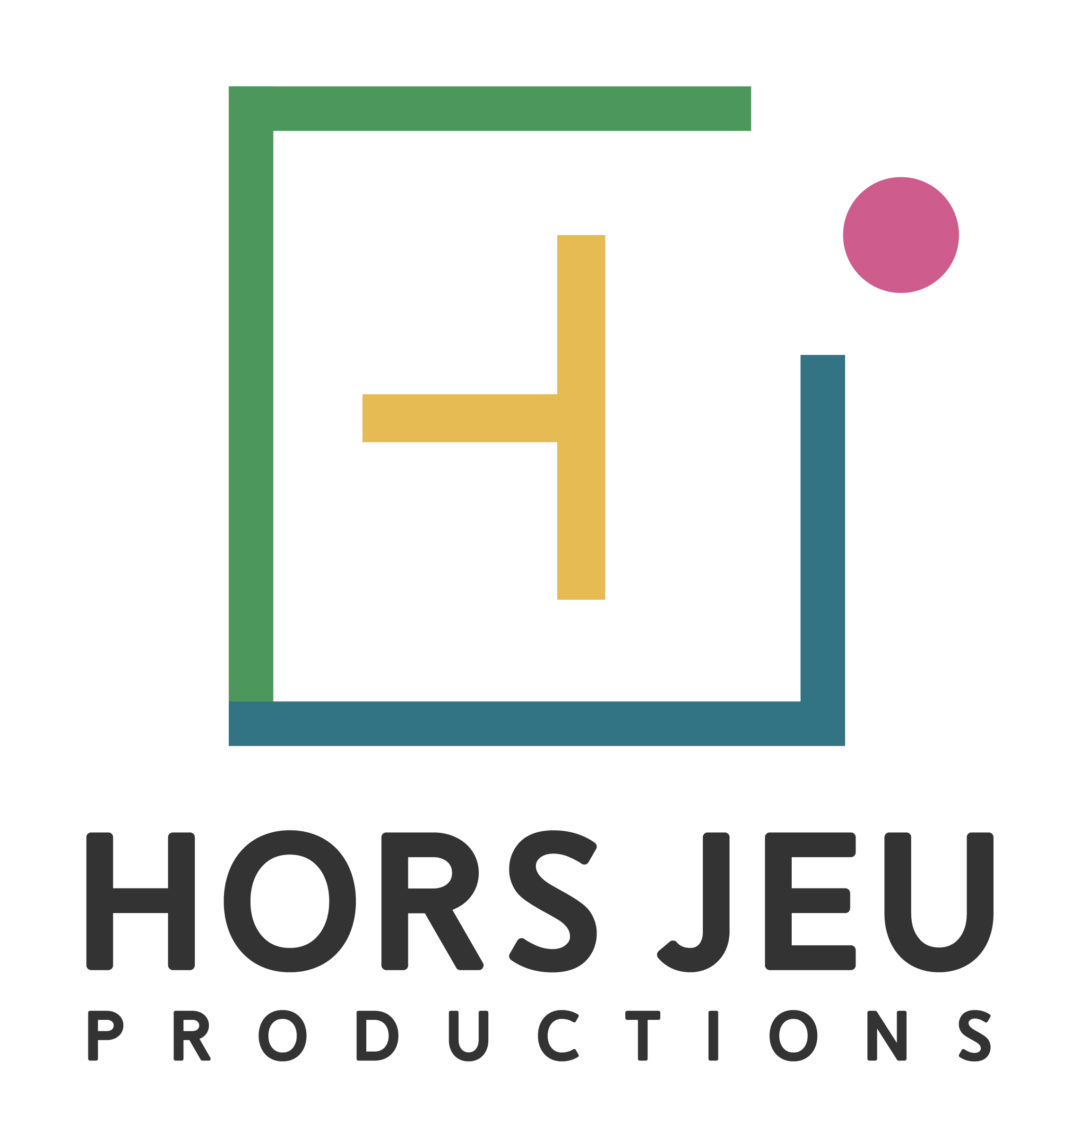 Productions HORS JEU